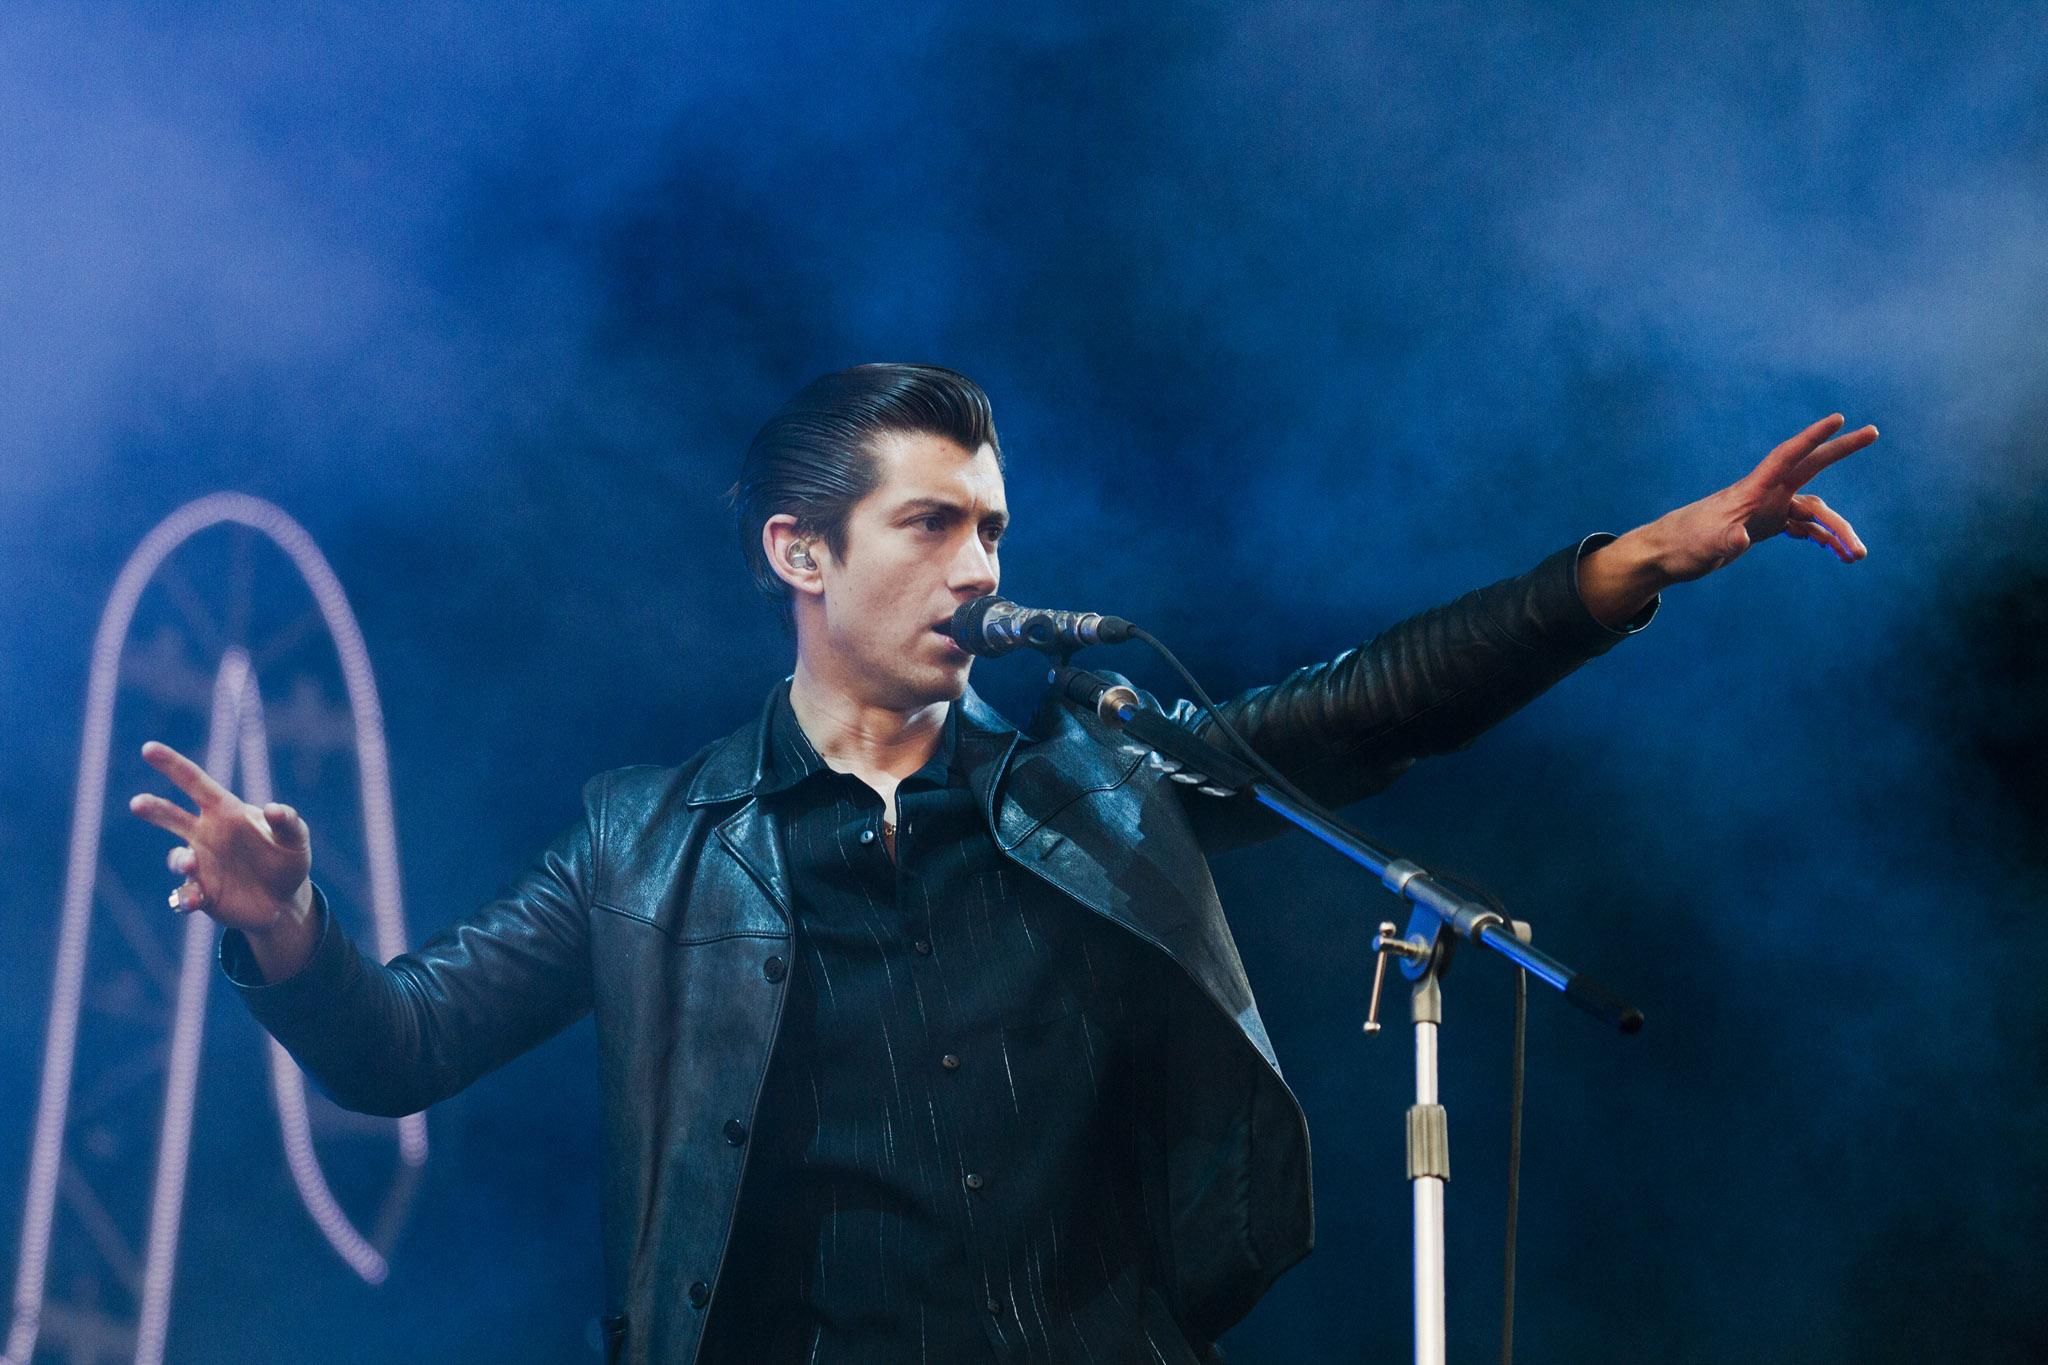 Arctic Monkeys win big at European Festival Awards 2014